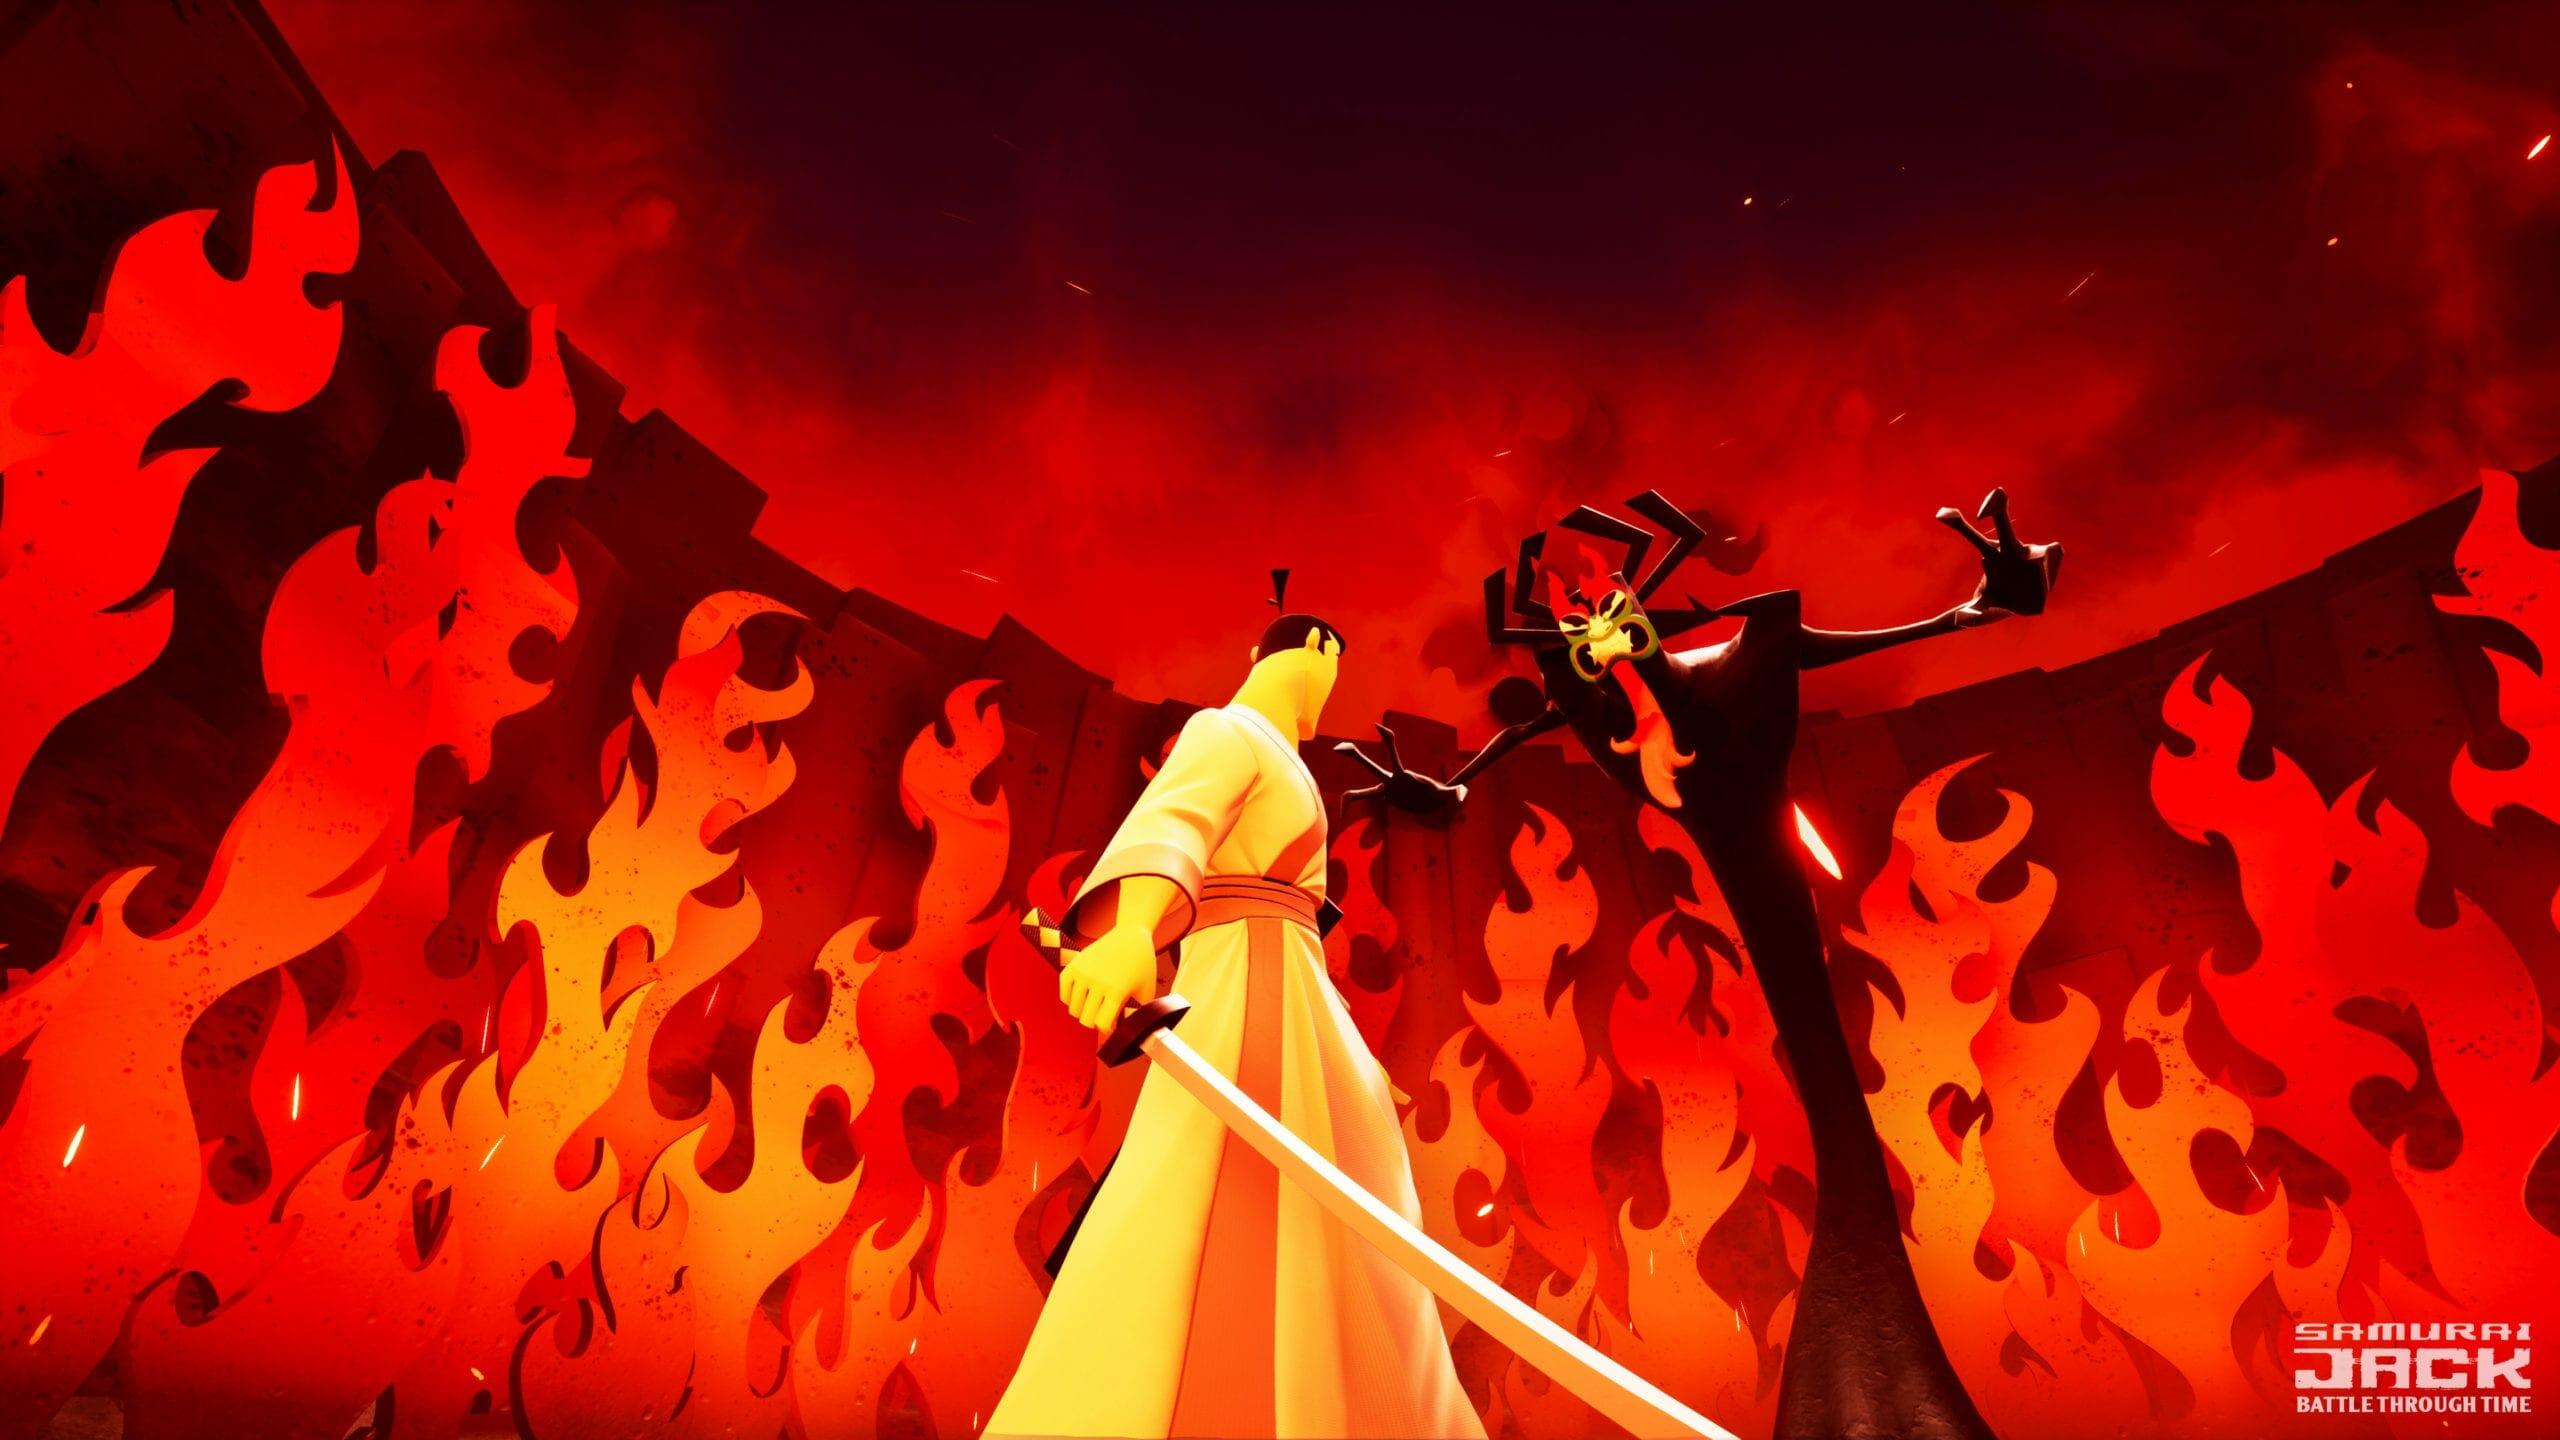 Samurai Jack: Battle Through Time System Requirements